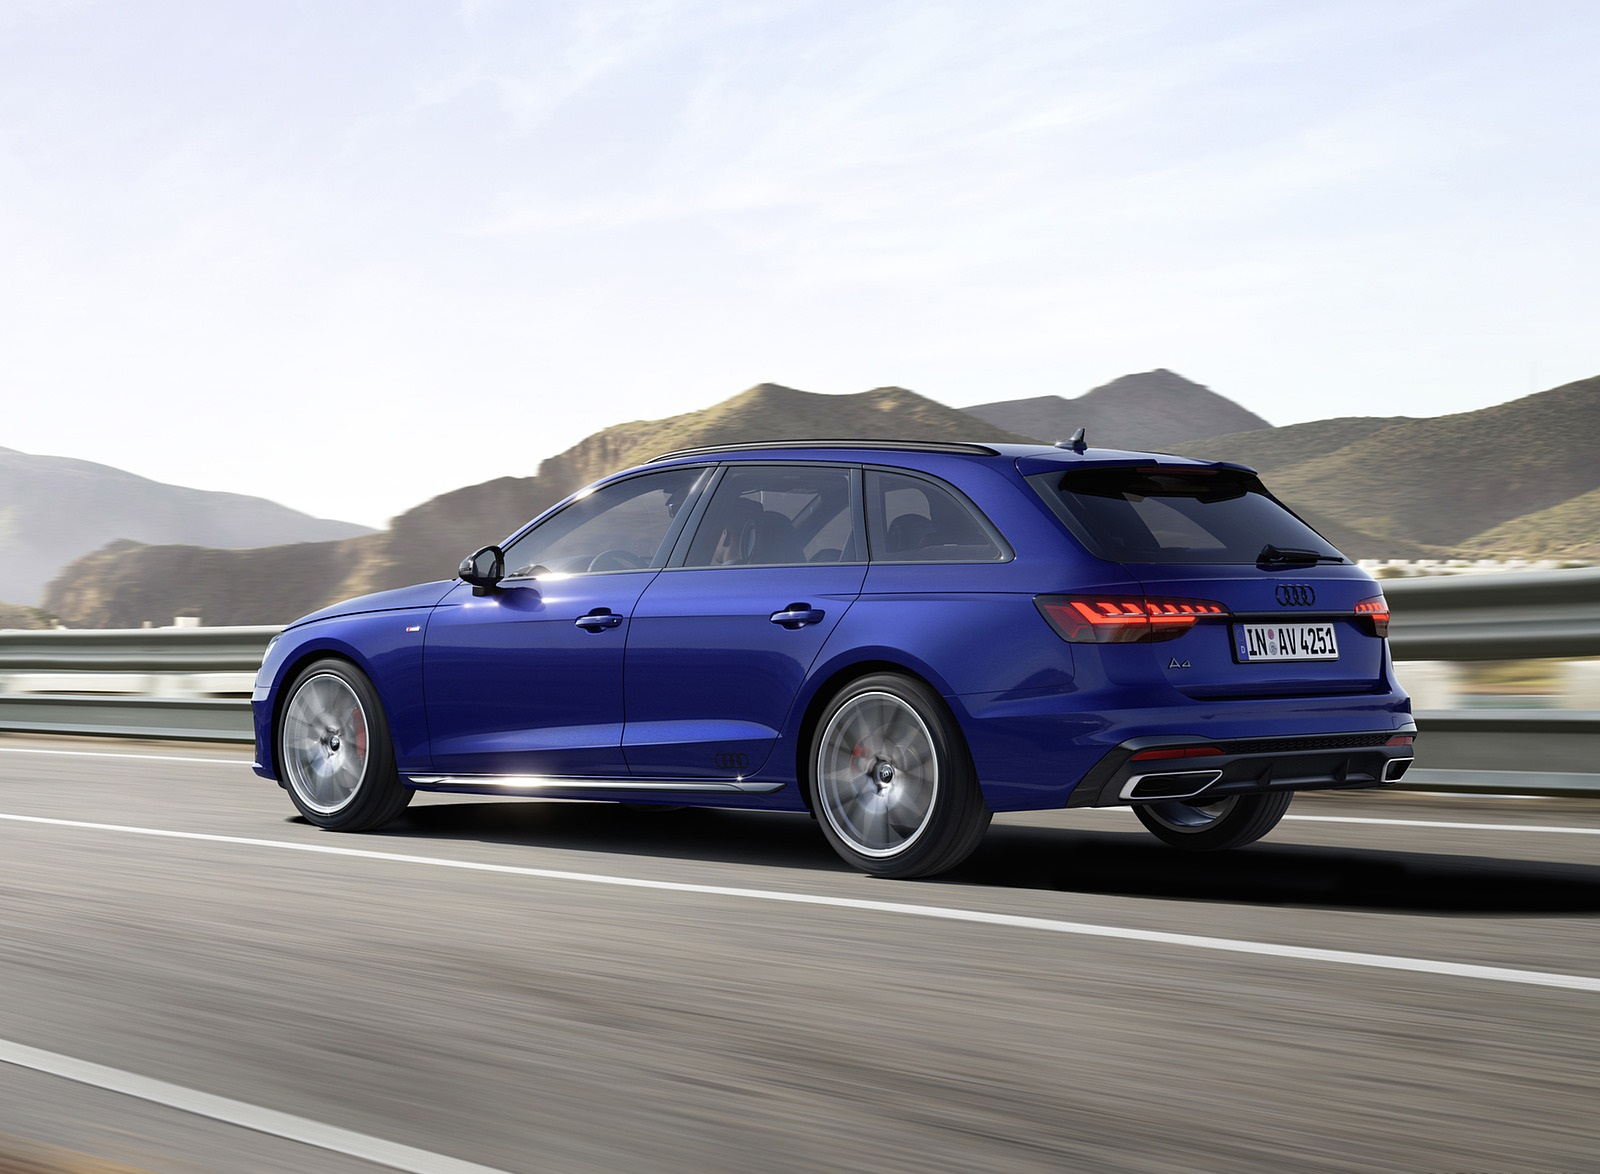 2022 Audi A4 Avant S Line Competition Plus (Color: Navarra Blue Metallic) Rear Three-Quarter Wallpapers  (2)